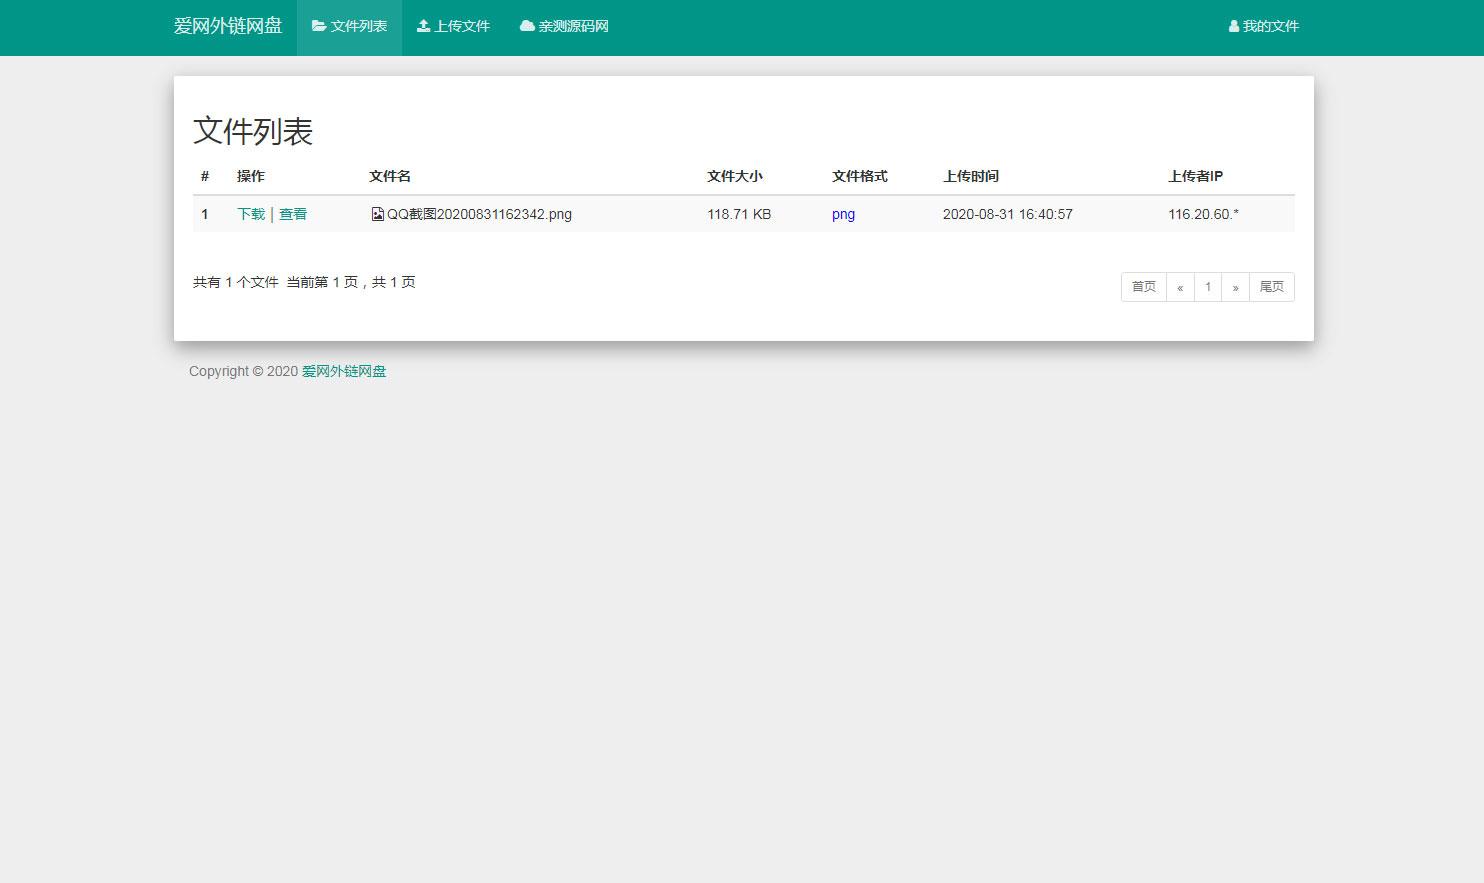 PHP响应式H5视频图片网盘外链系统源码 自适应PC手机端 支持图床图片违规检测